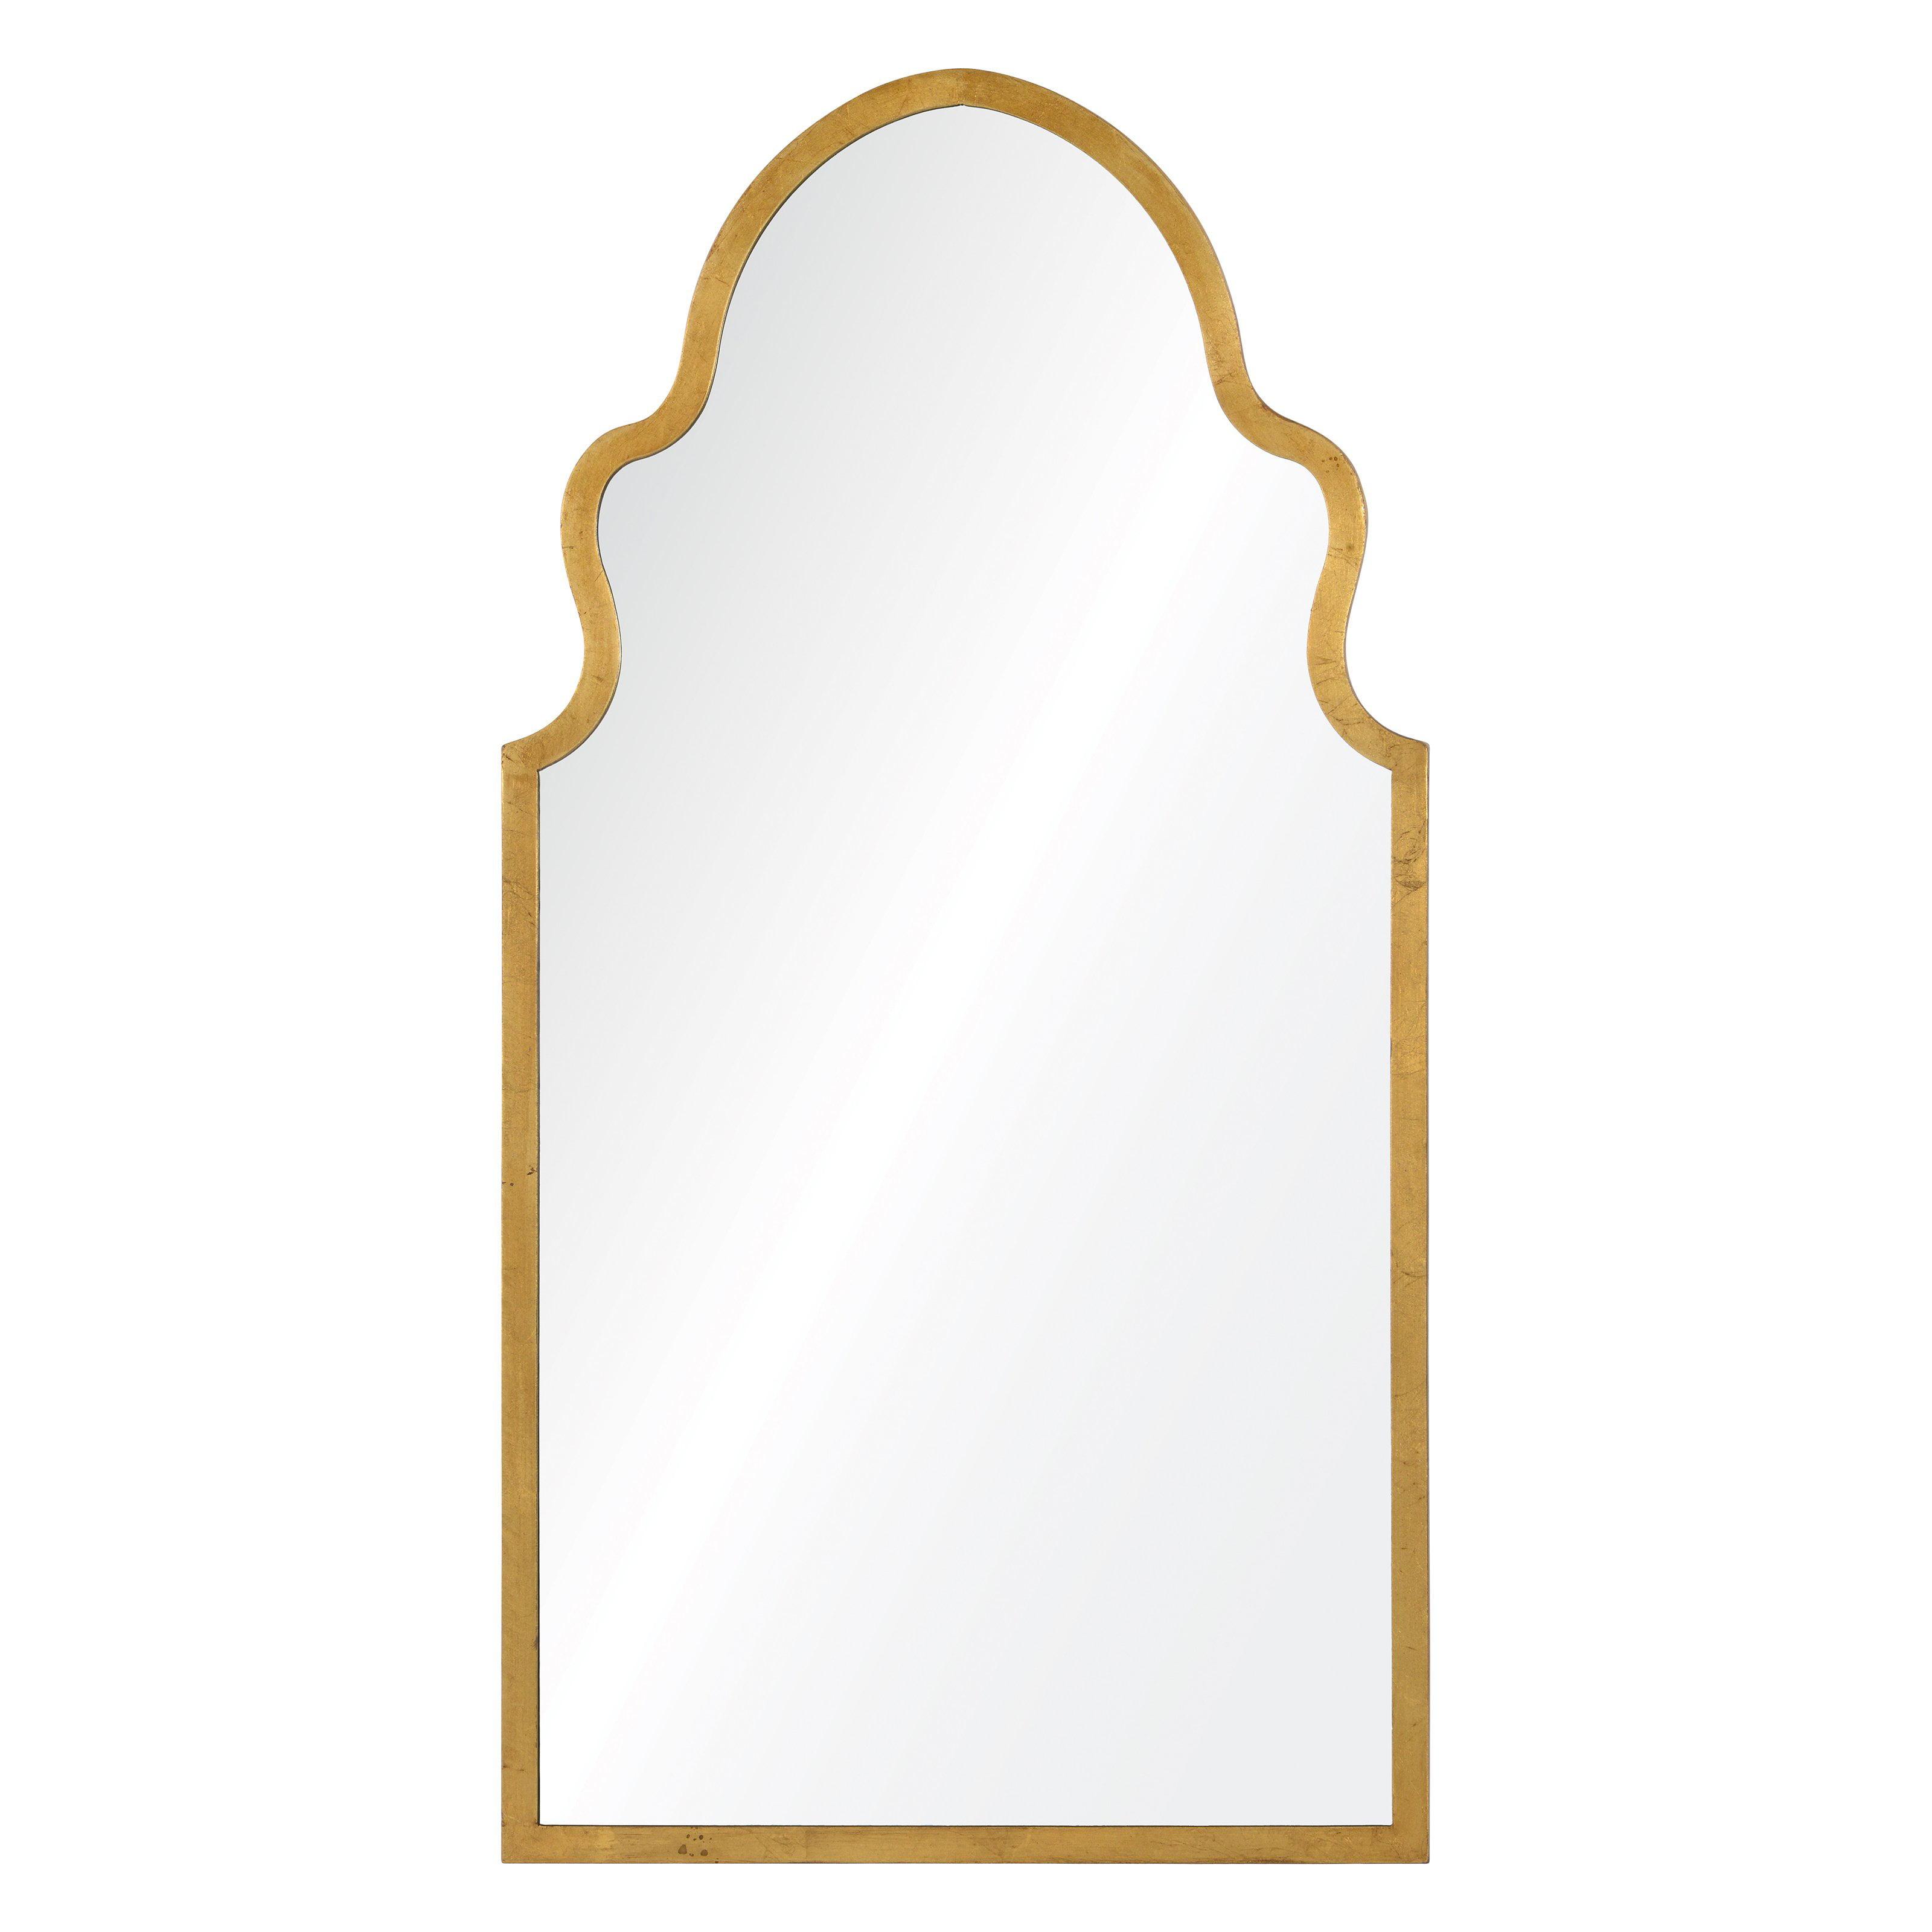 Cooper Classics Lincoln Wall Mirror by Cooper Classics